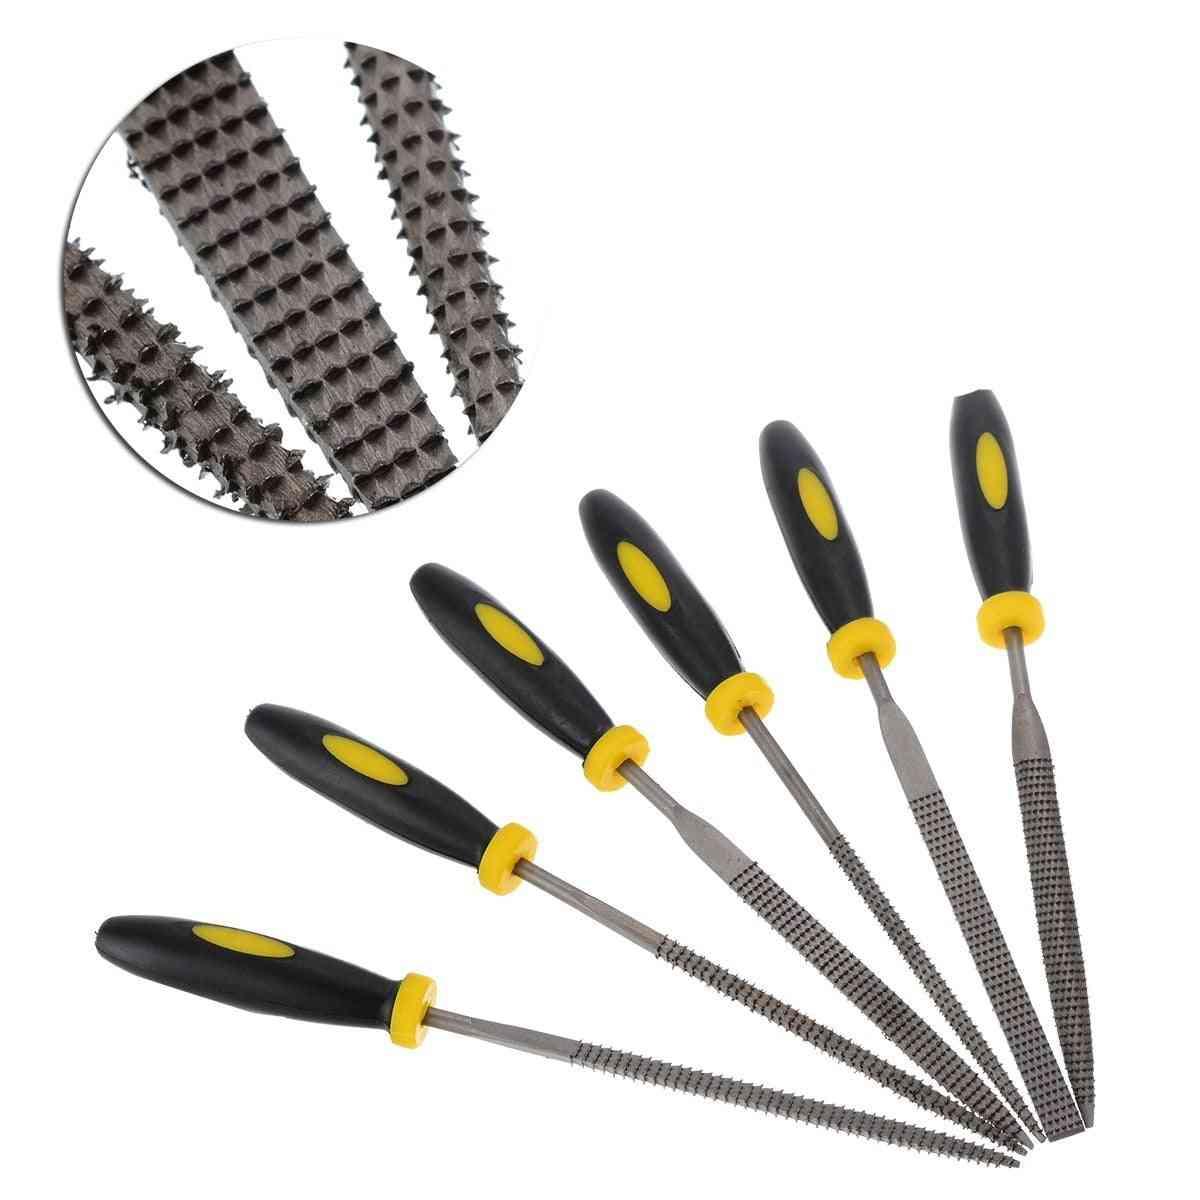 Small Wooden Rasp Set- Flat Round, Square, Triangle Halbrund Needle Tools